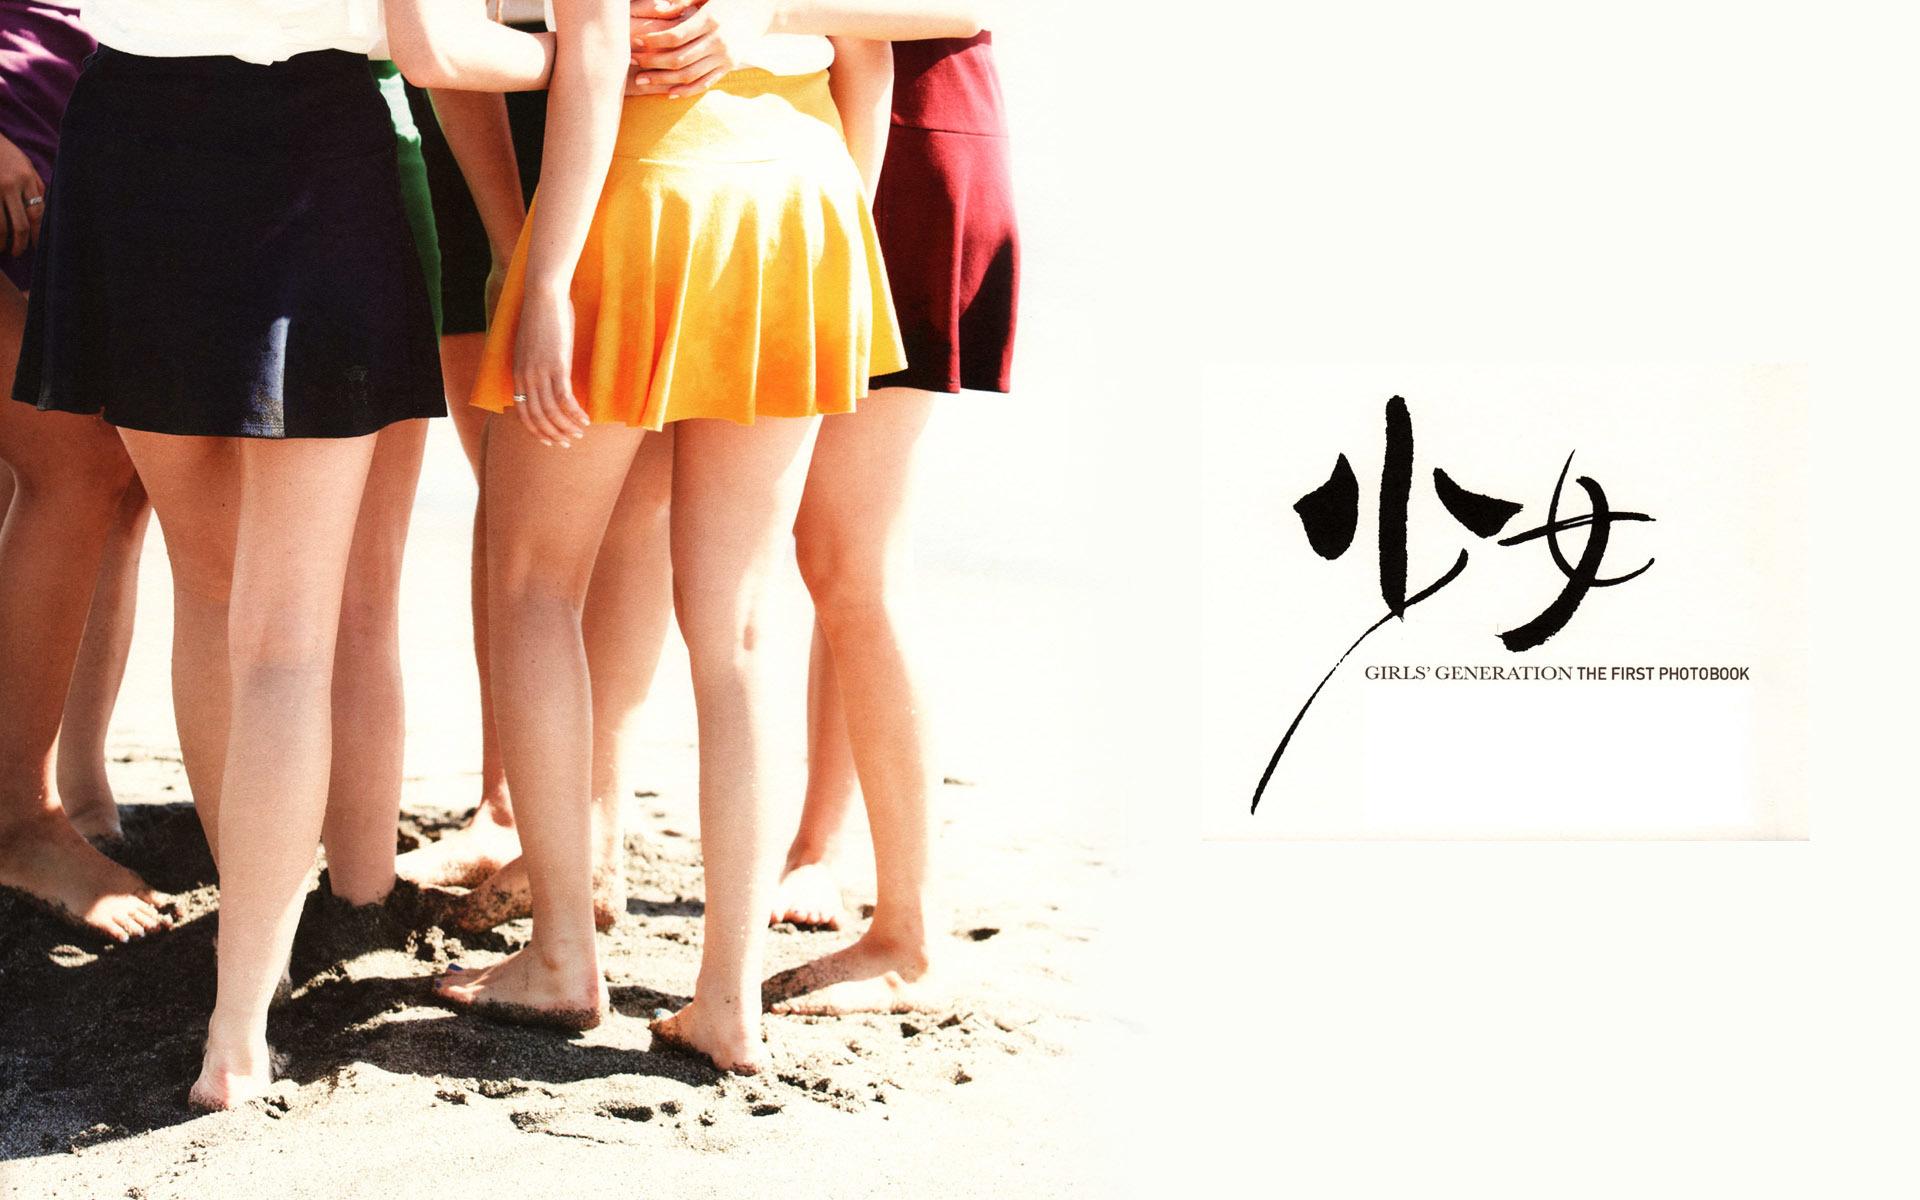 Snsd Wallpaper on Women Girls Generation Snsd Celebrity Hd Wallpaper   Girls   823008